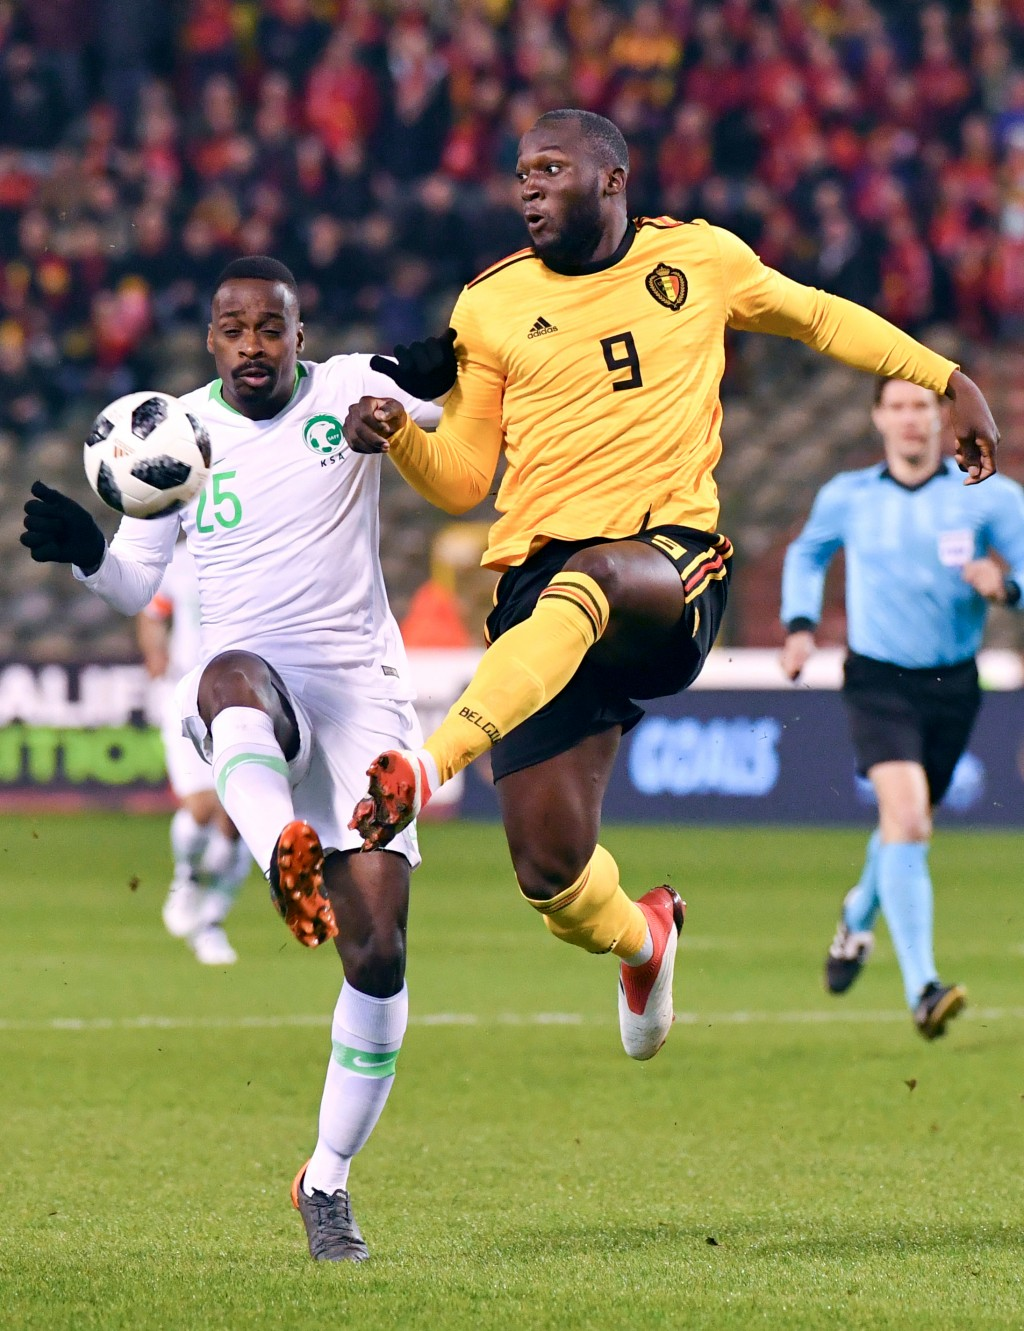 FILE - In this Tuesday, March 27, 2018 filer, Belgium's Romelu Lukaku, center, goes up against Saudi Arabia's Motaz Hawsawi during an international fr...